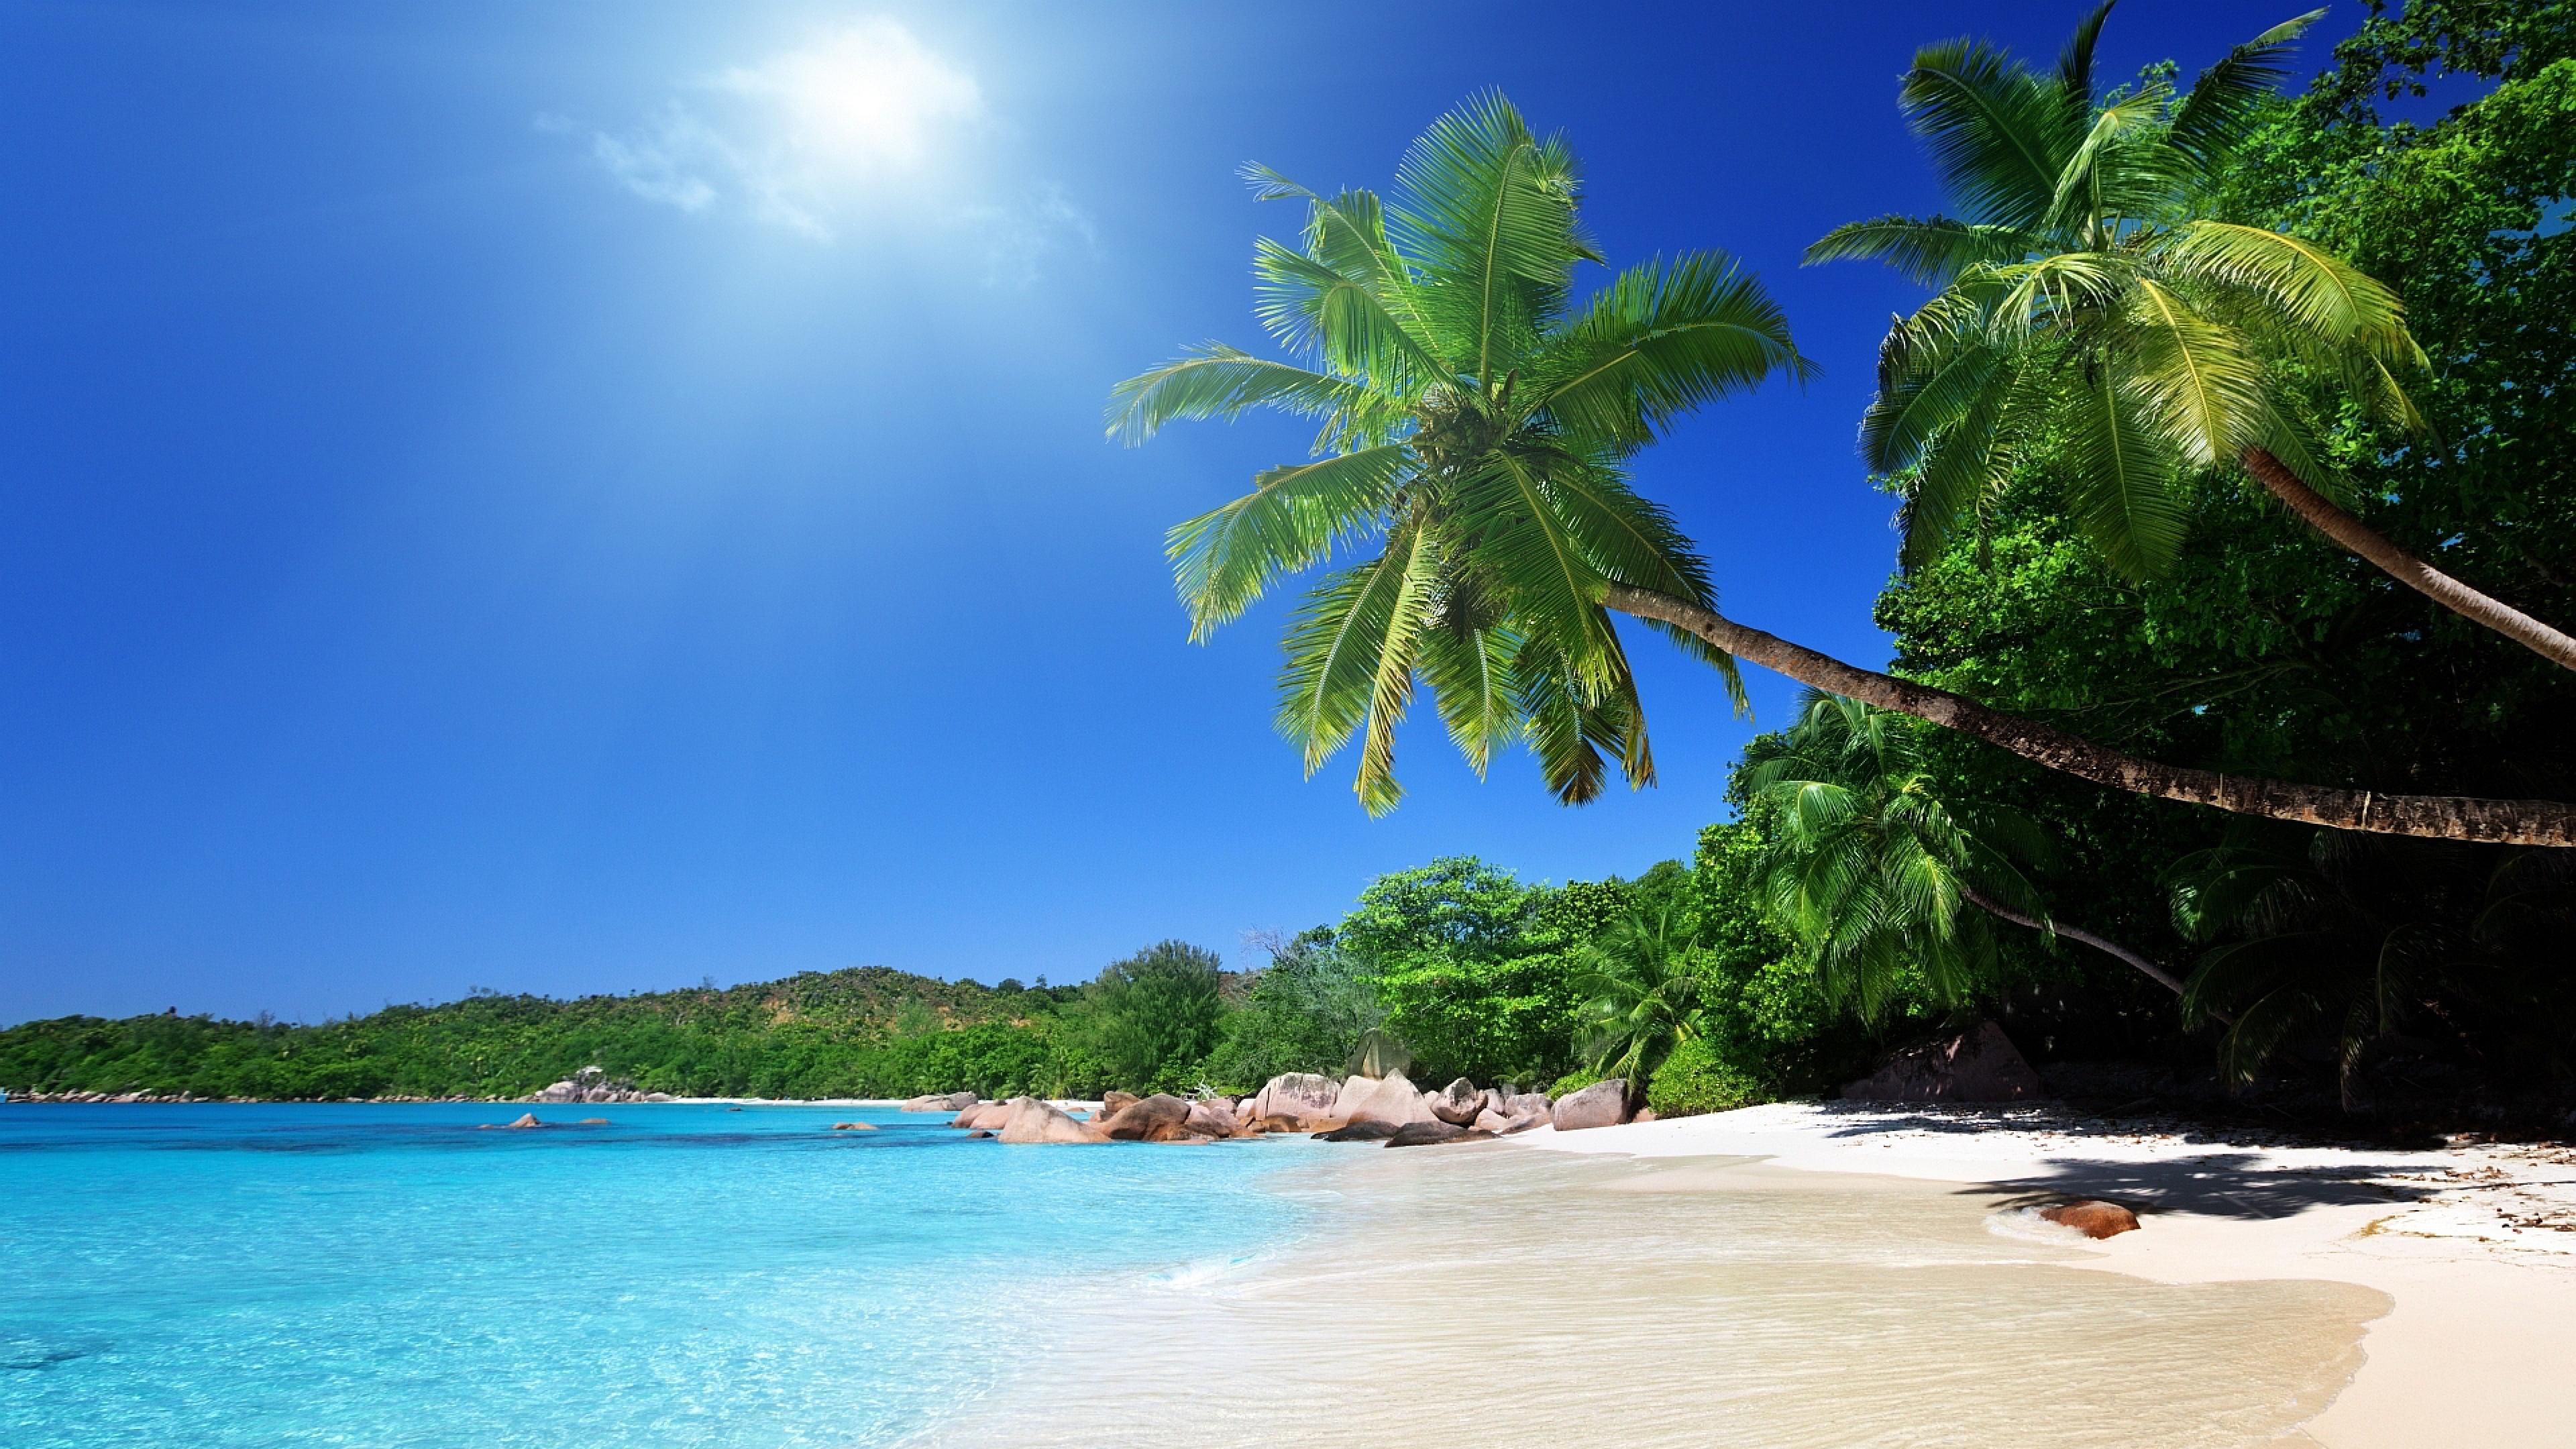 Download Wallpaper 3840x2400 Maldives, Beach, Tropical, Sea, Sand ...